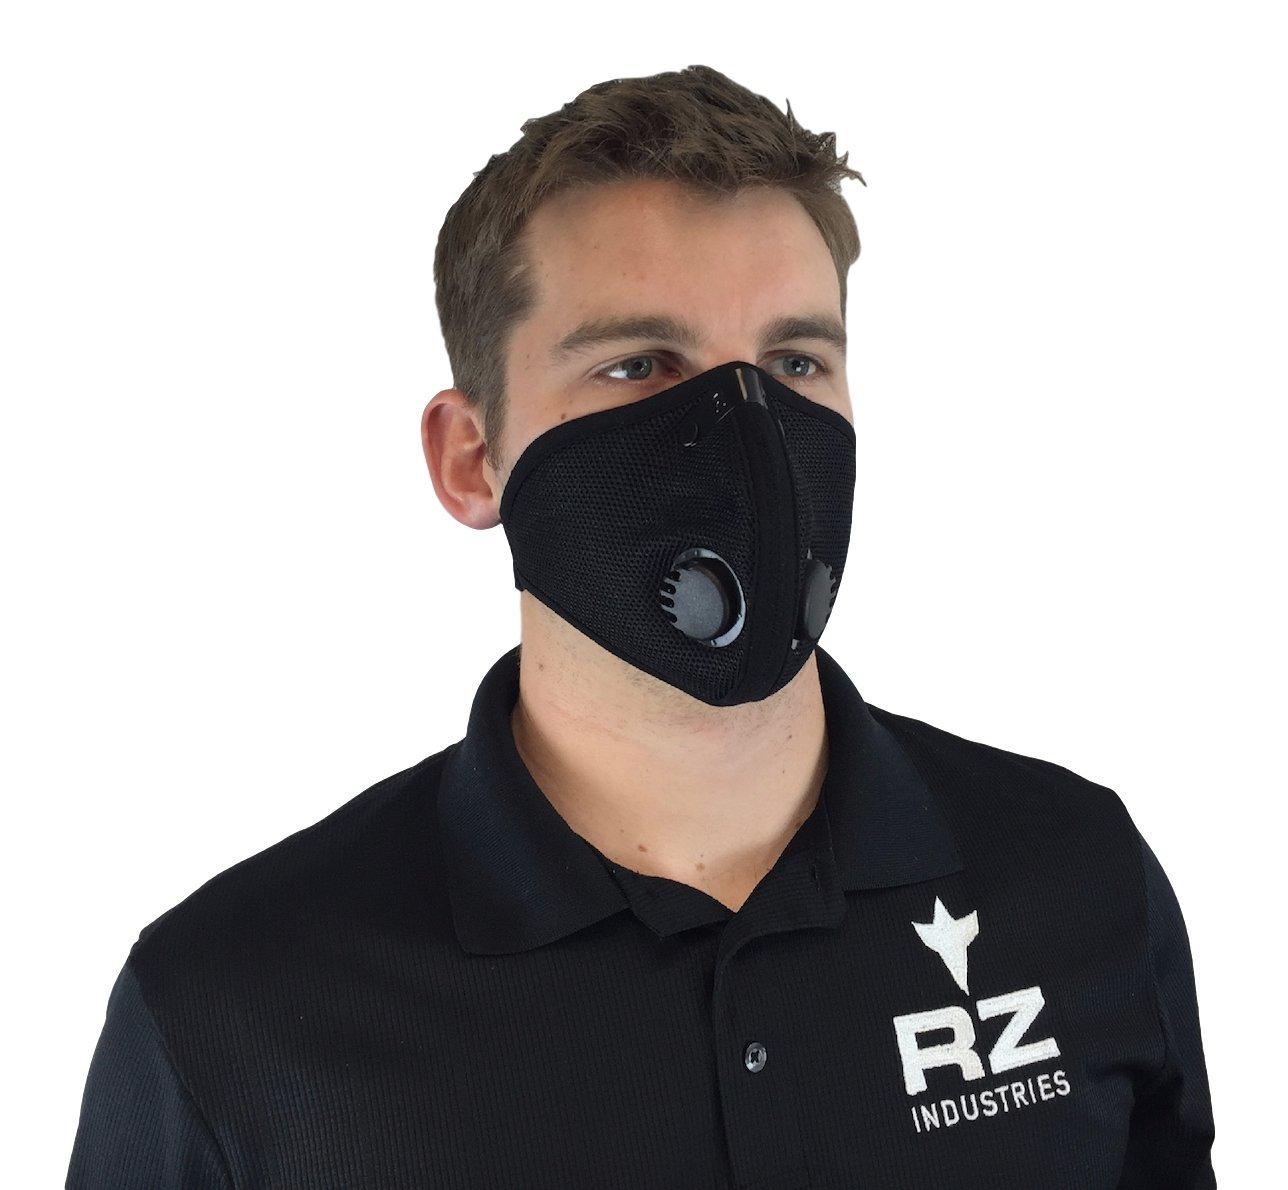 RZ Dust/Pollution Mask Bonus Pack w/5 Laboratory Tested Filters, Model M2, Mesh, Black, Size Regular/Large